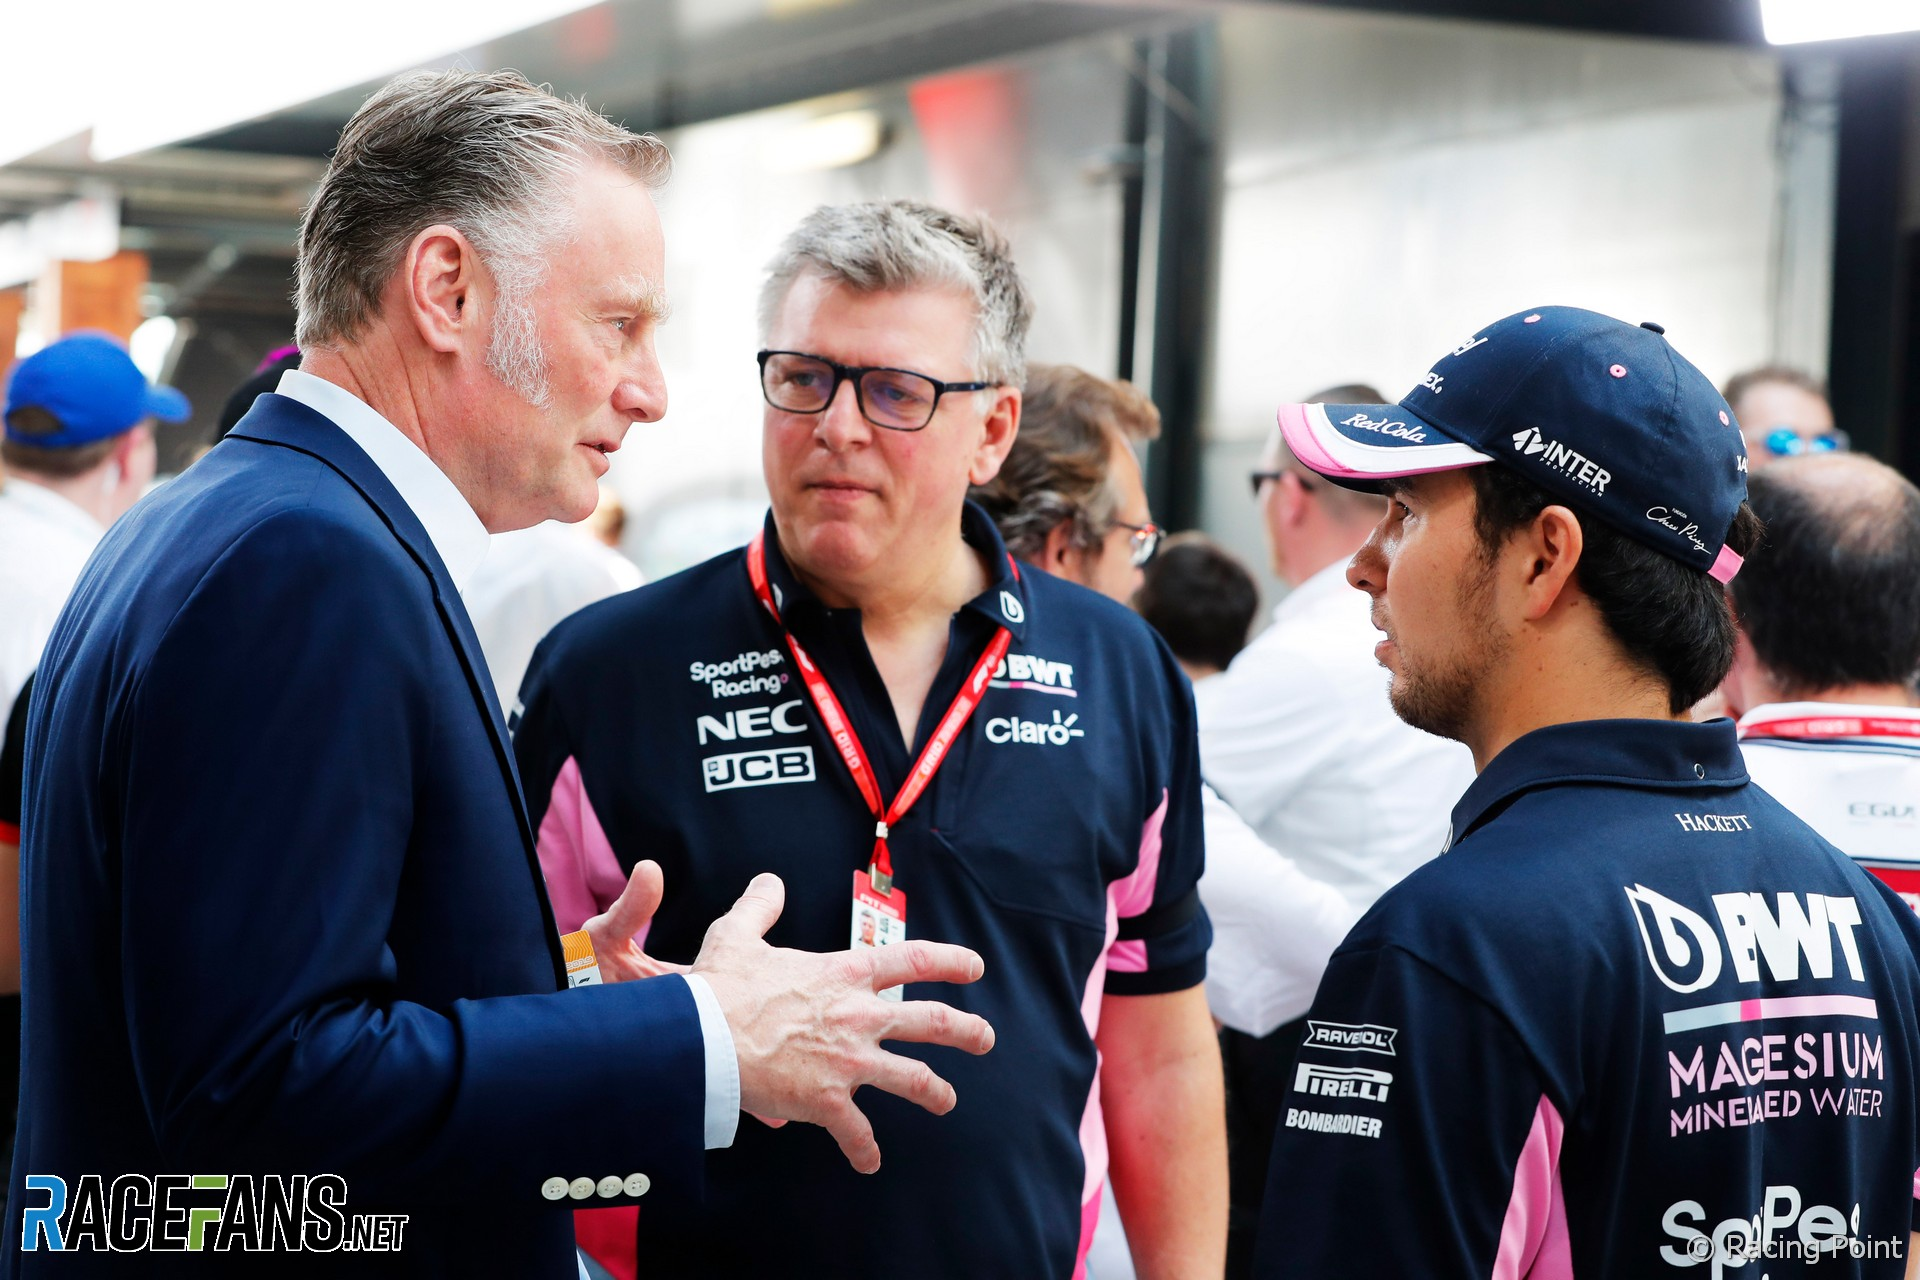 Sean Bratches, Otmar Szafnauer, Sergio Perez, Racing Point, Albert Park, 2019